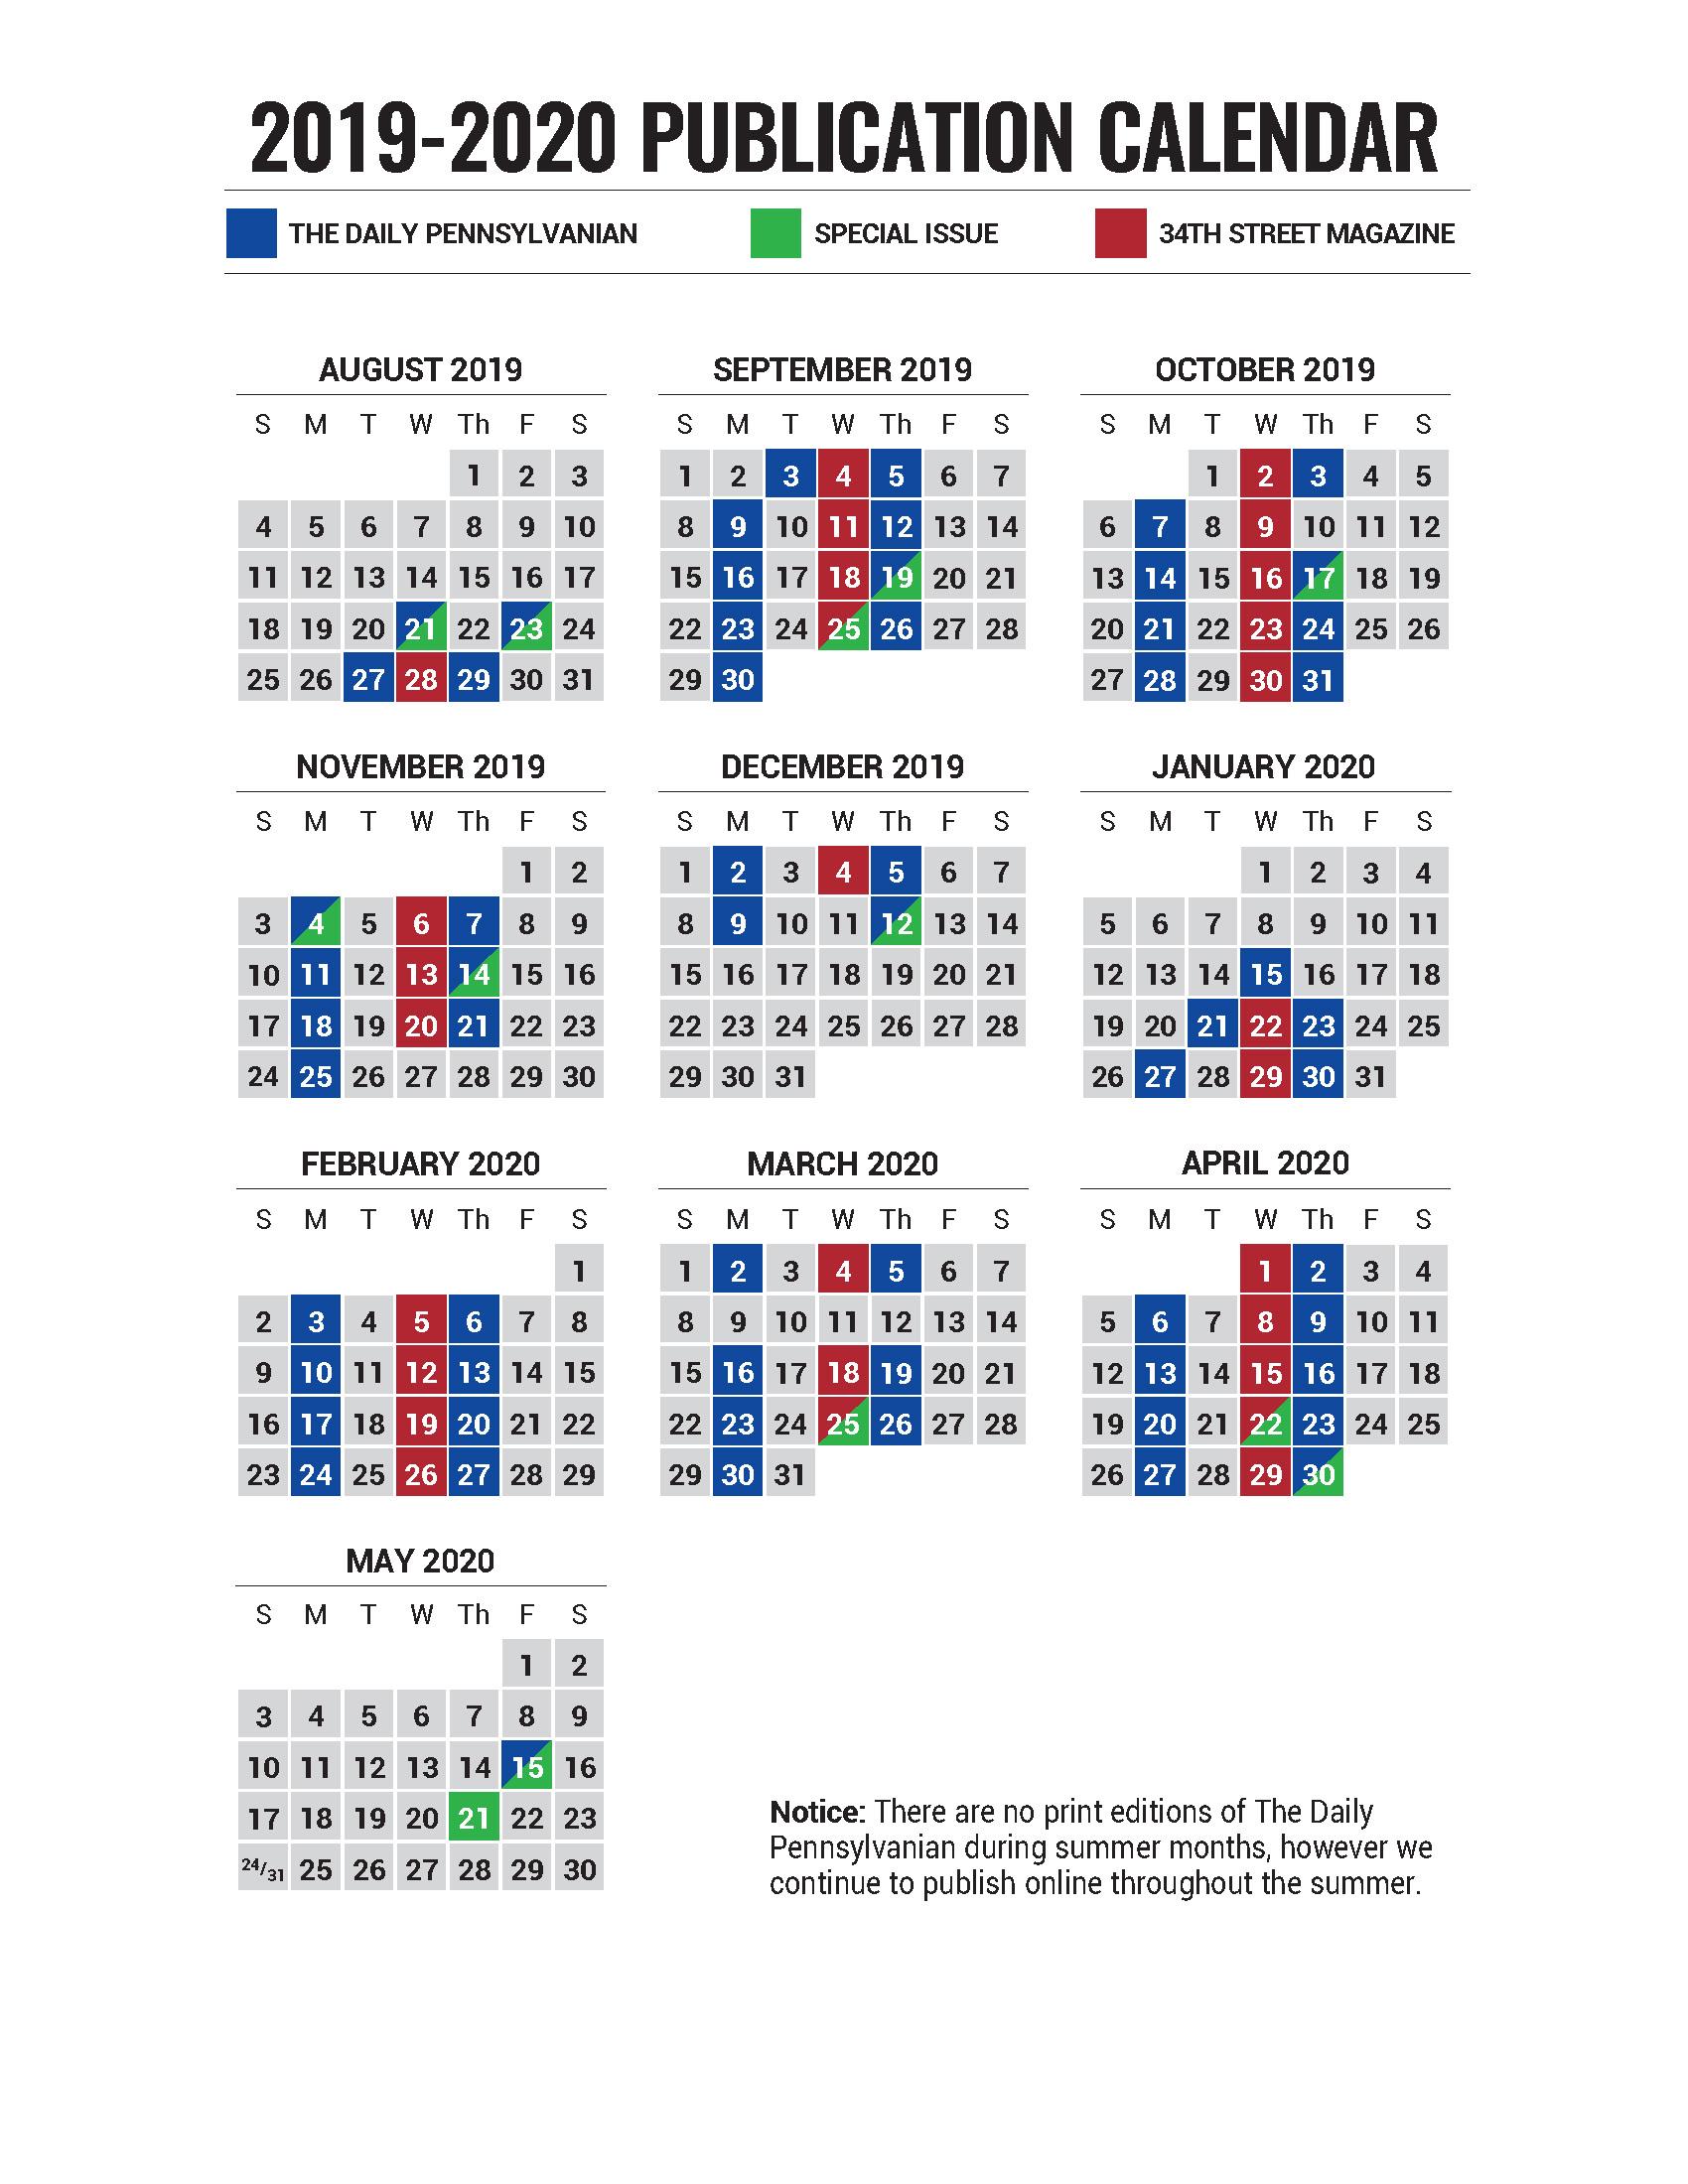 2019-2020 Publication Calendar